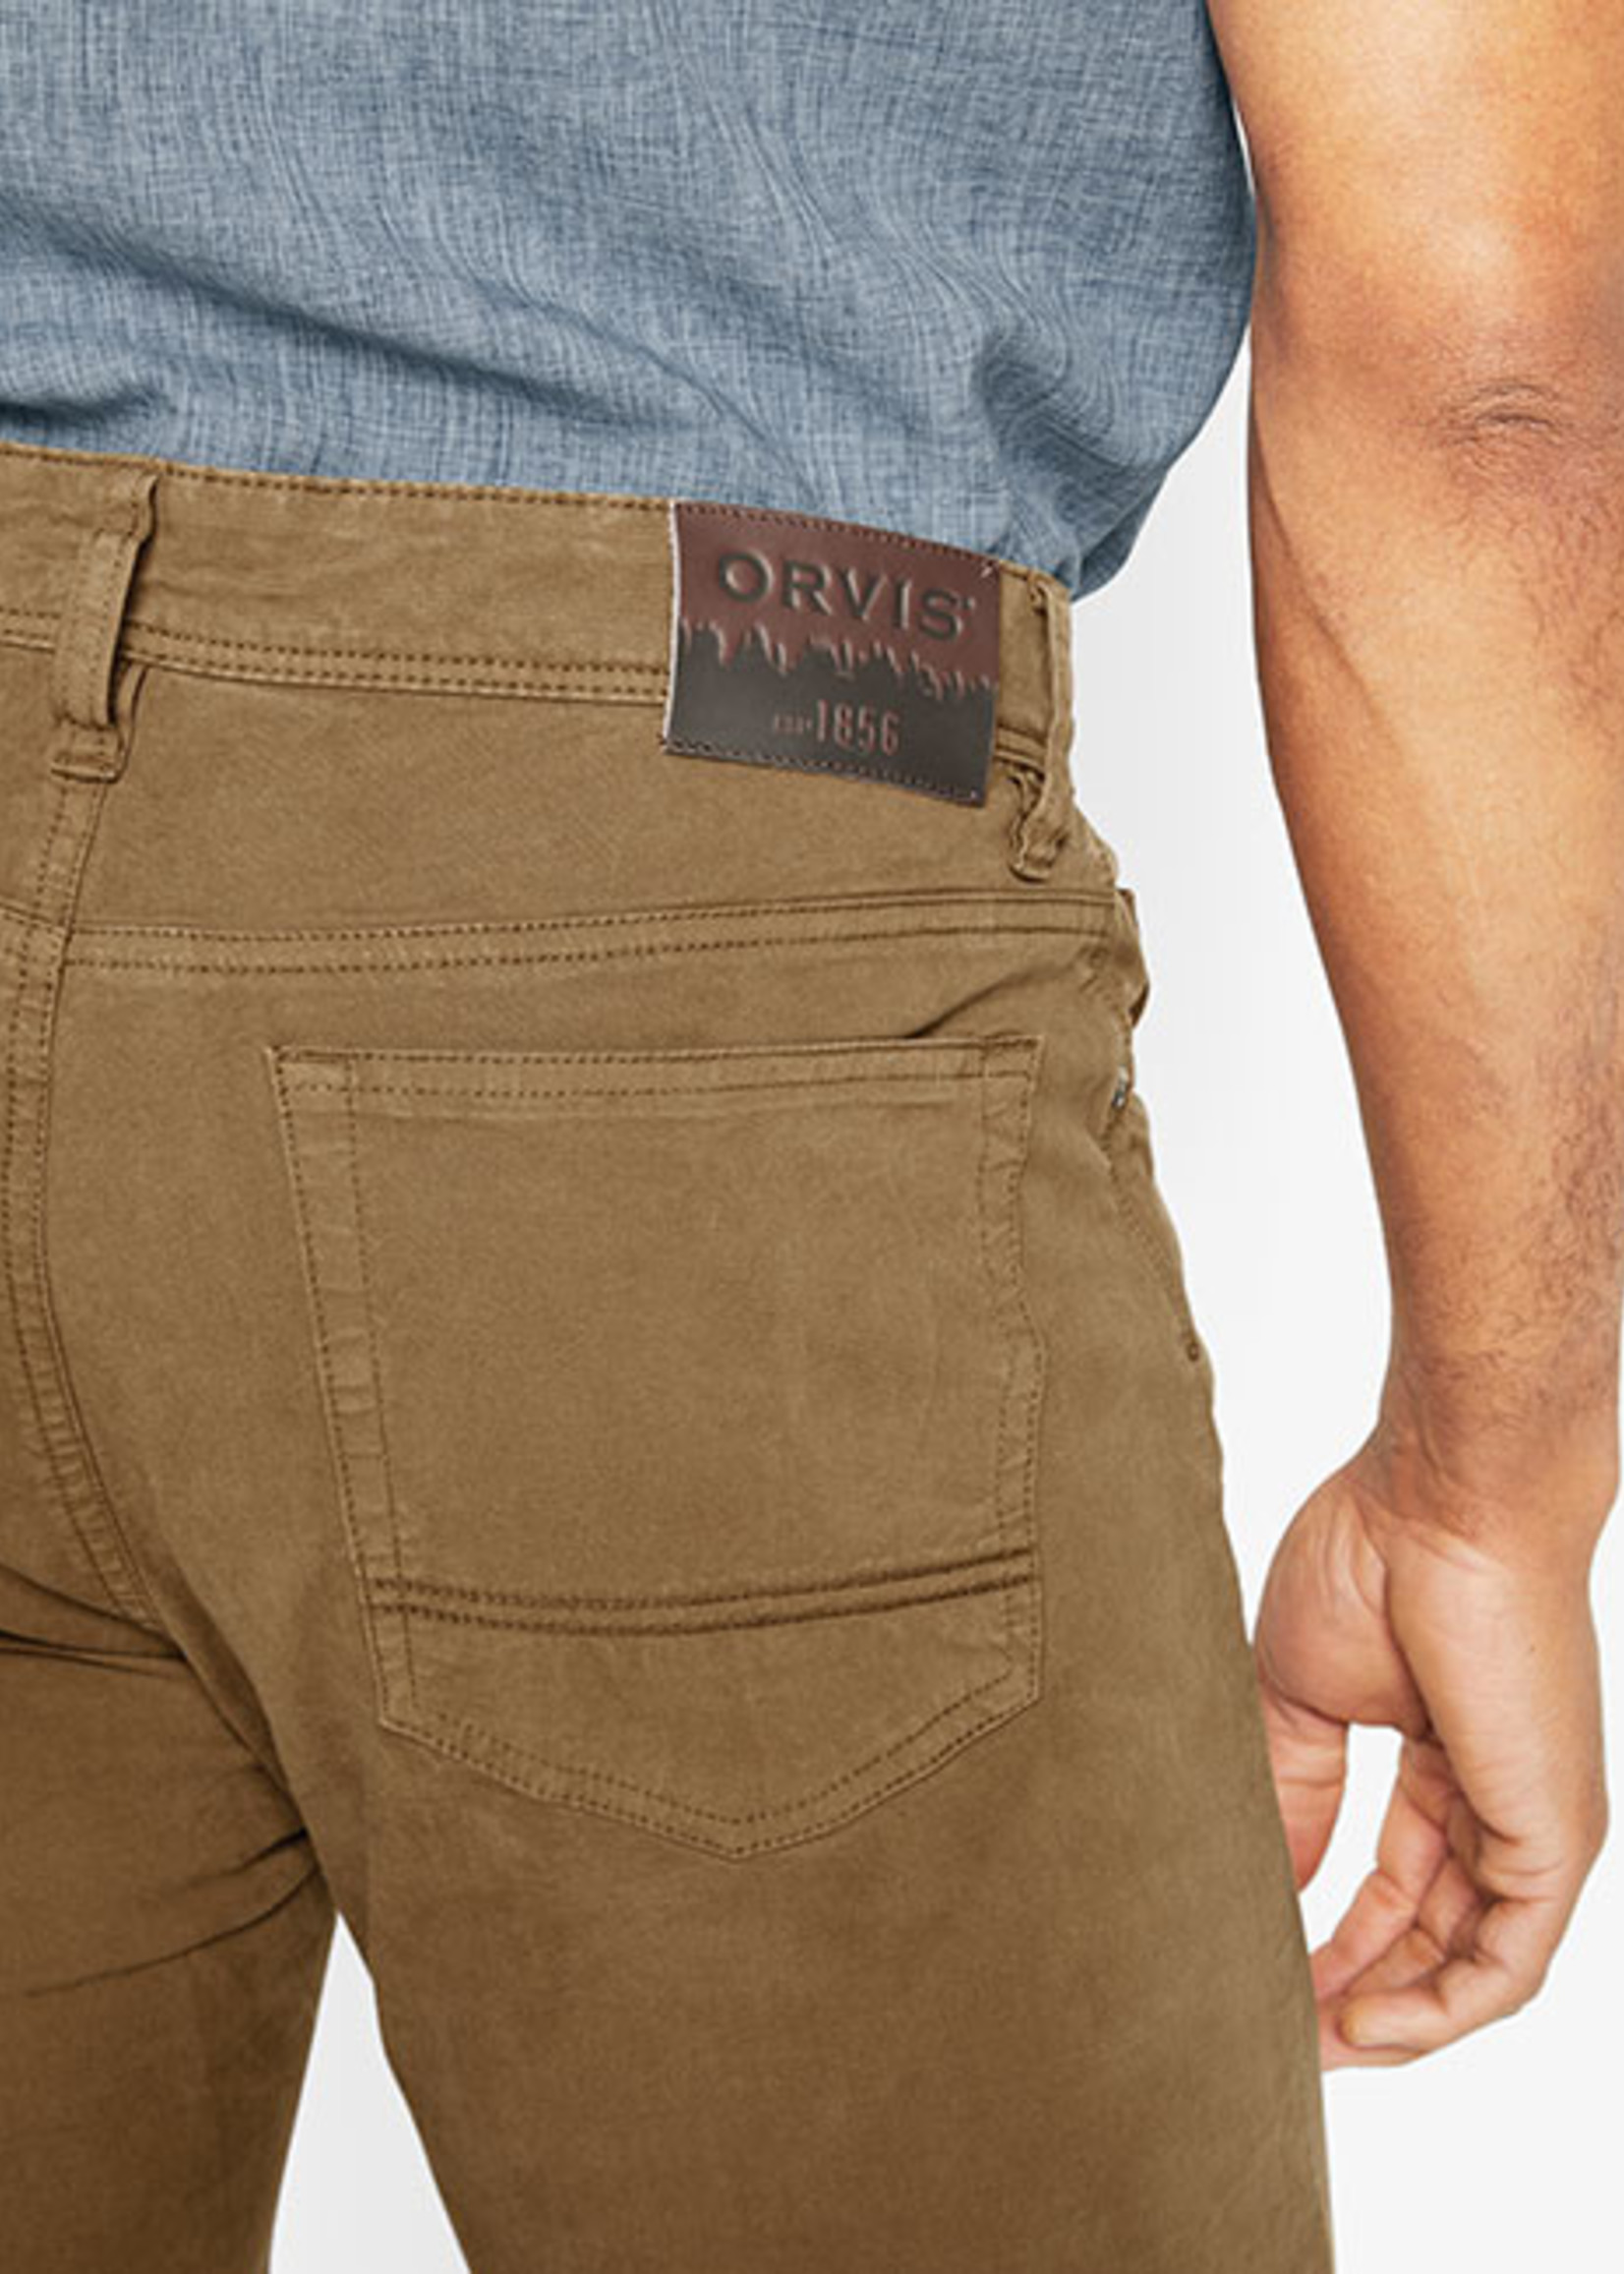 Orvis 5 Pocket Stretch Twill Desert Khaki